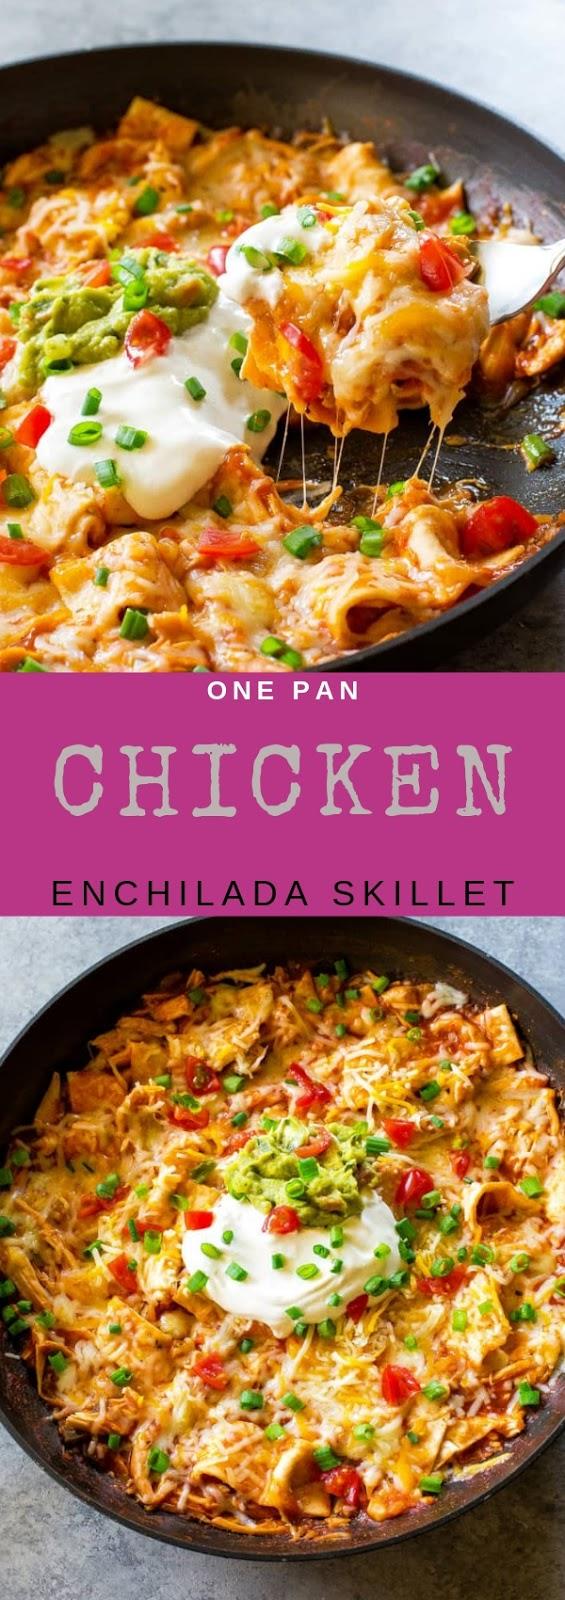 One Pan Chicken Enchilada Skillet #maincourse #onepan #chicken #enchilada #skillet